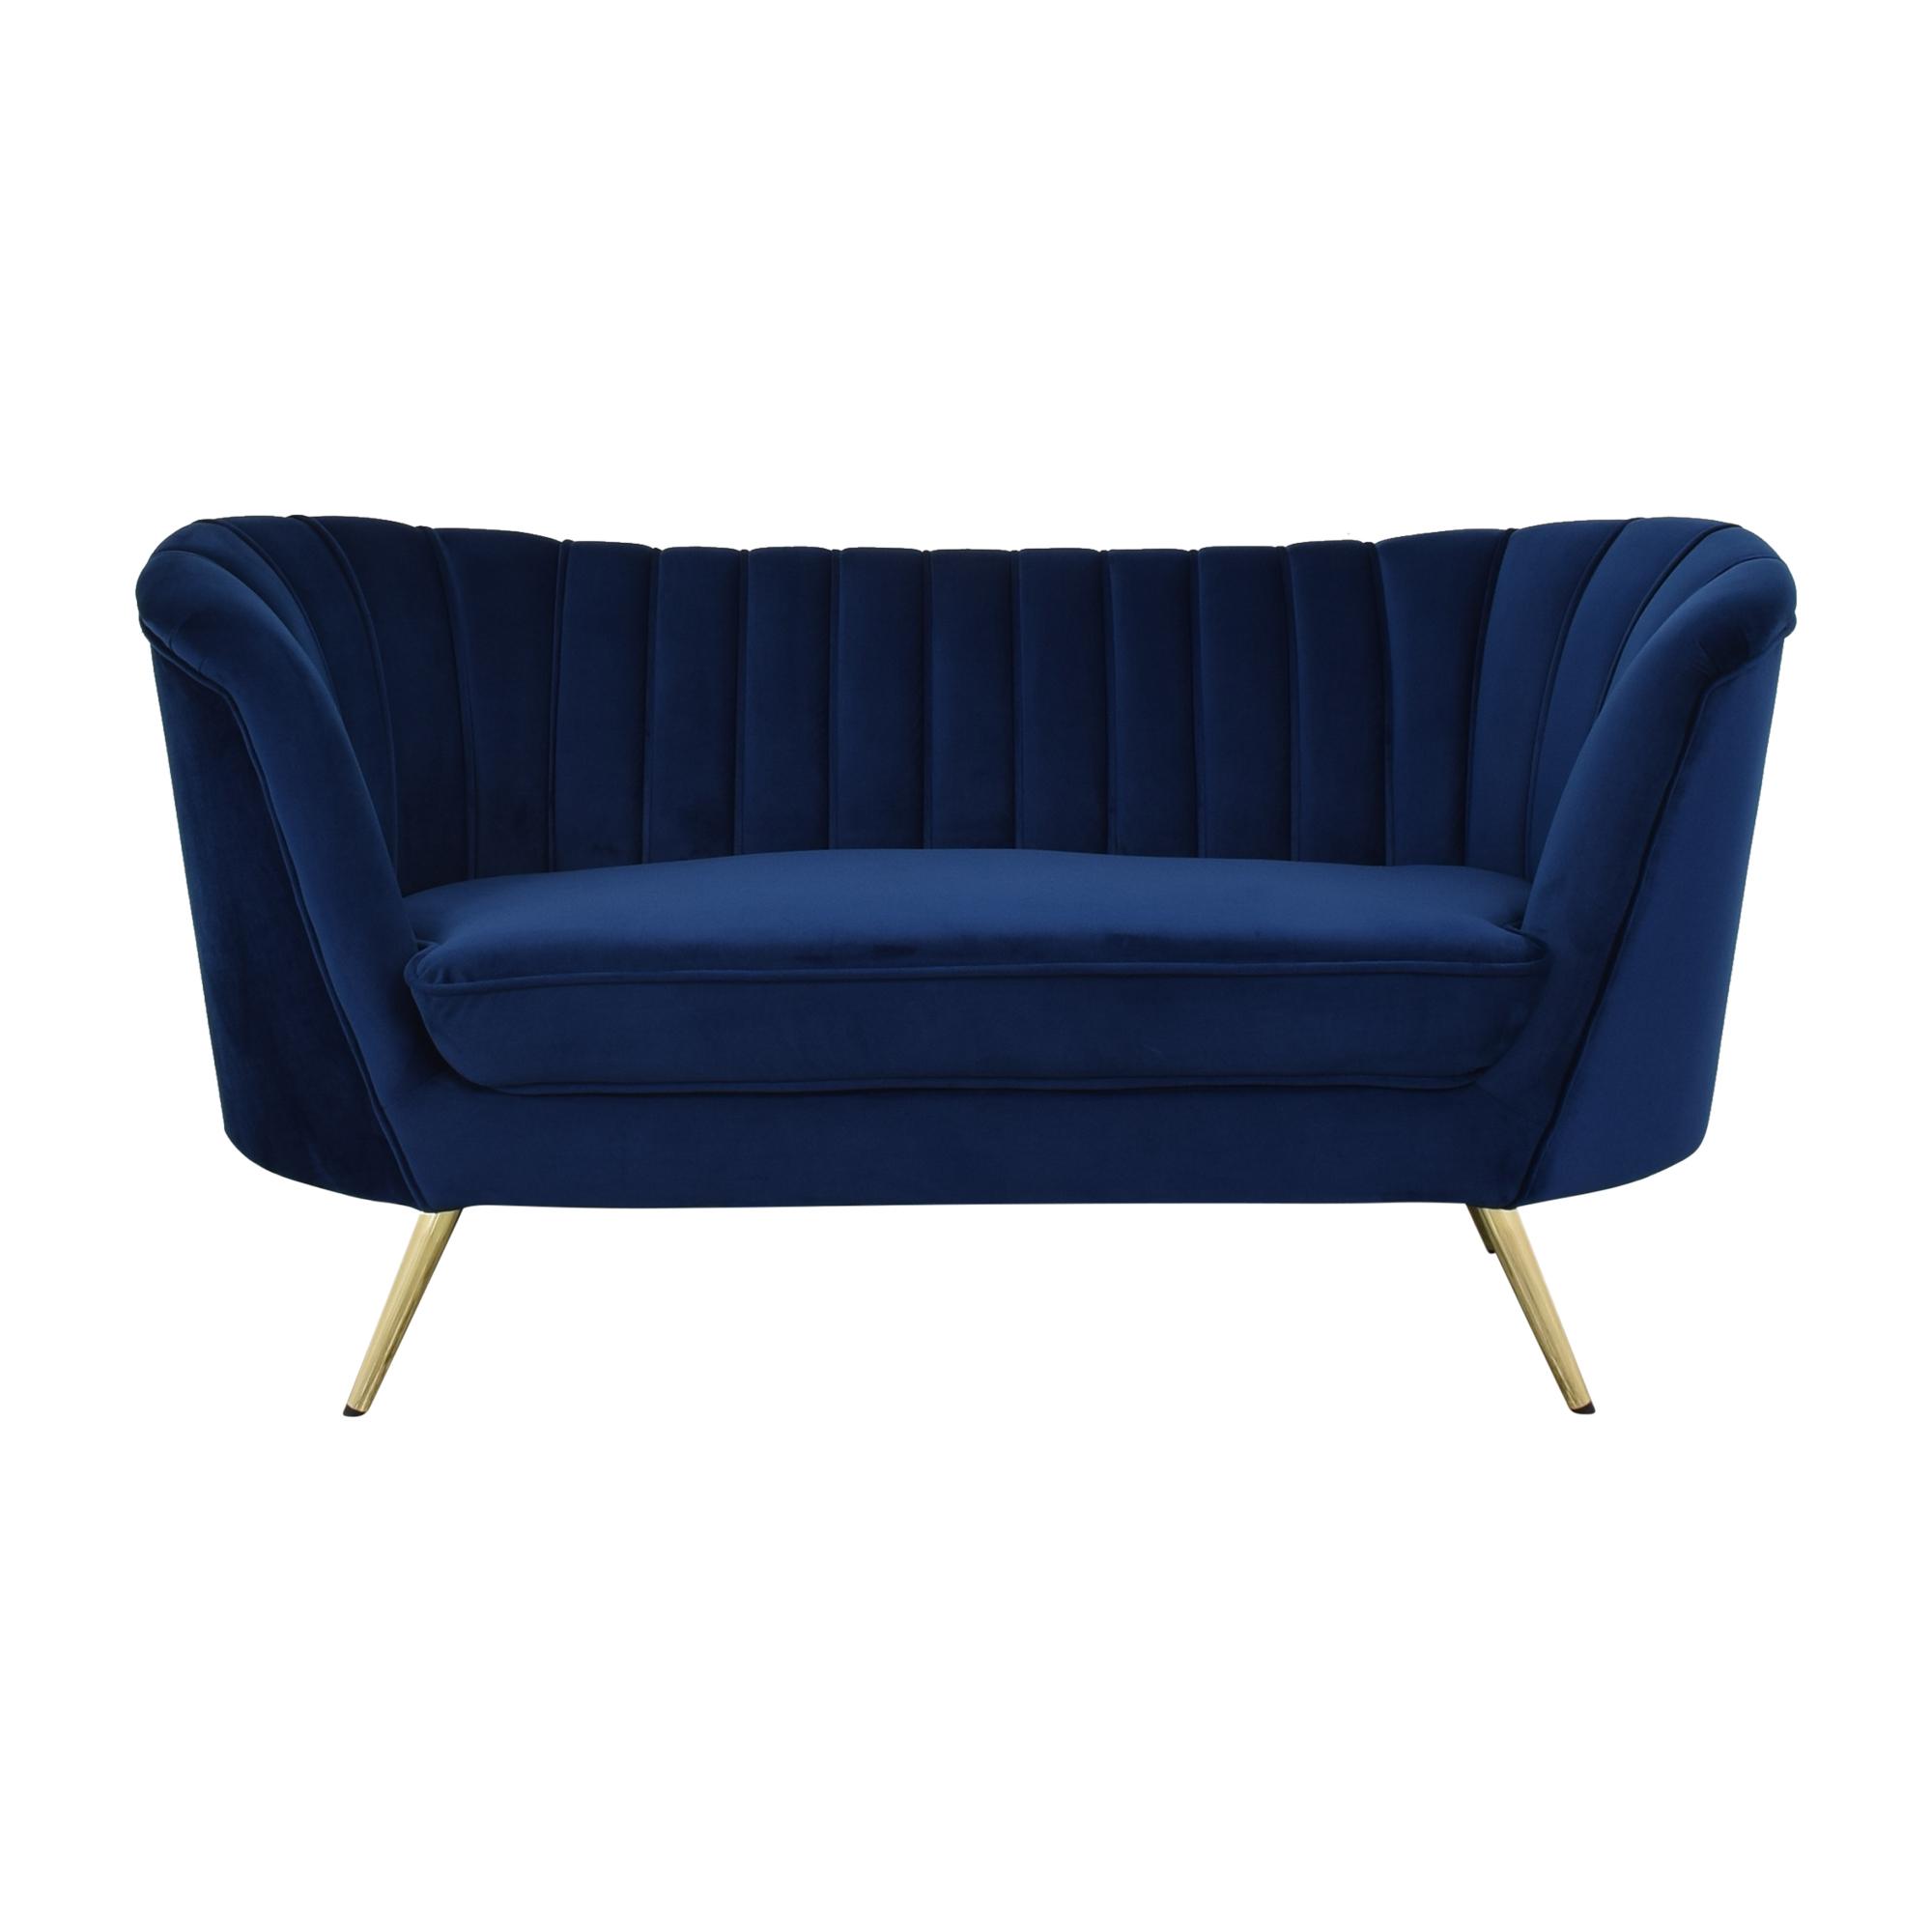 Wayfair Wayfair Koger Chesterfield Round Sofa on sale